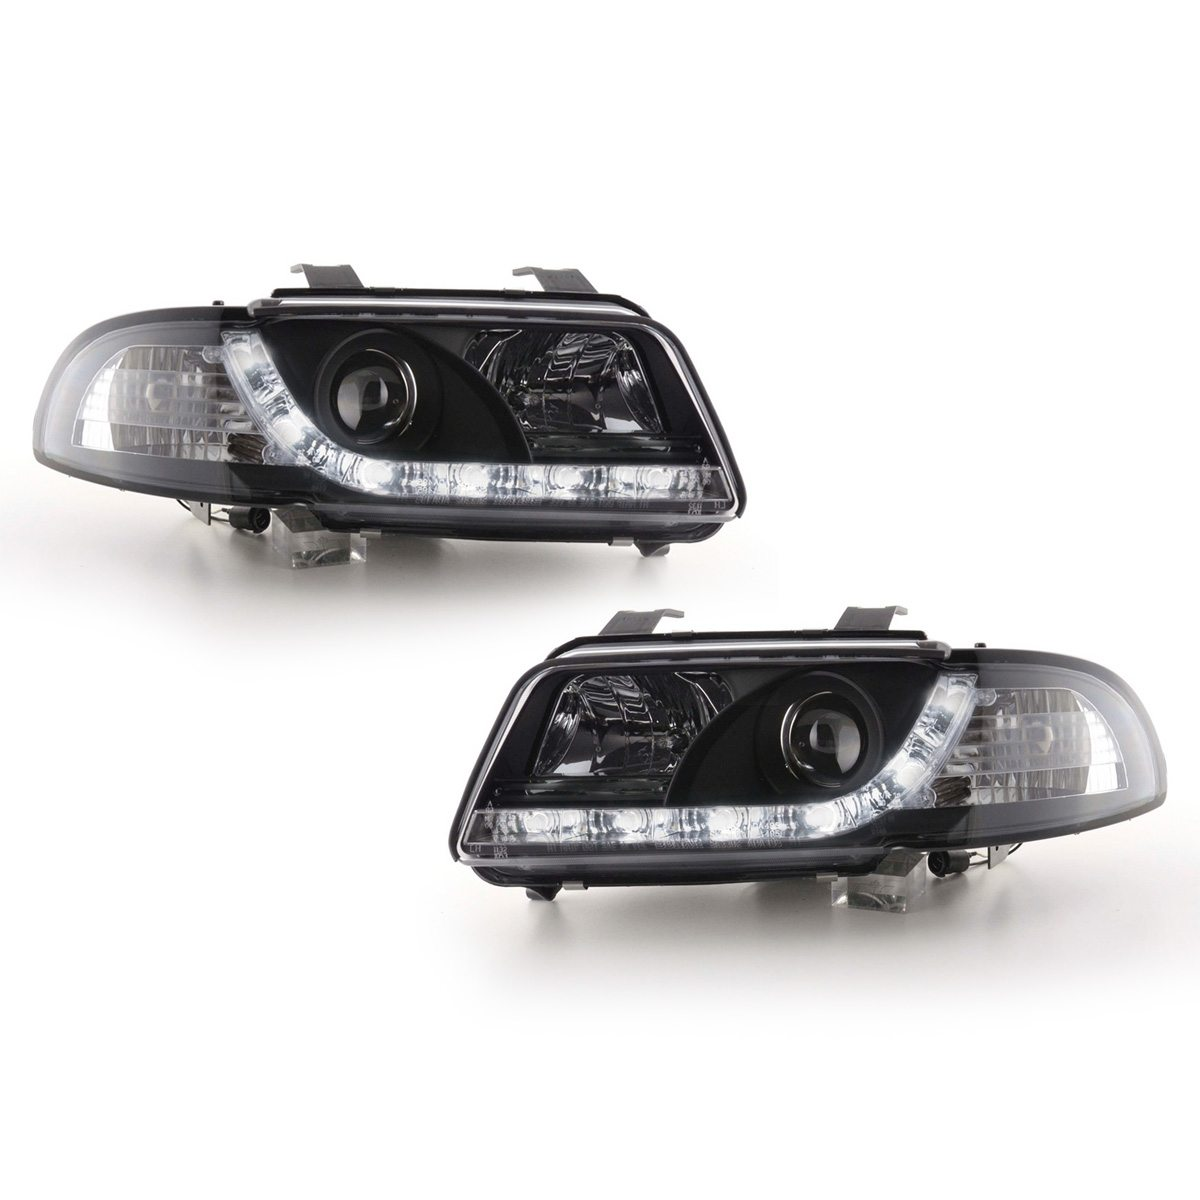 Audi-A4-B5-LimAvant-96-00-Faróis-Angel-Eyes-Dayline-Pretos-1